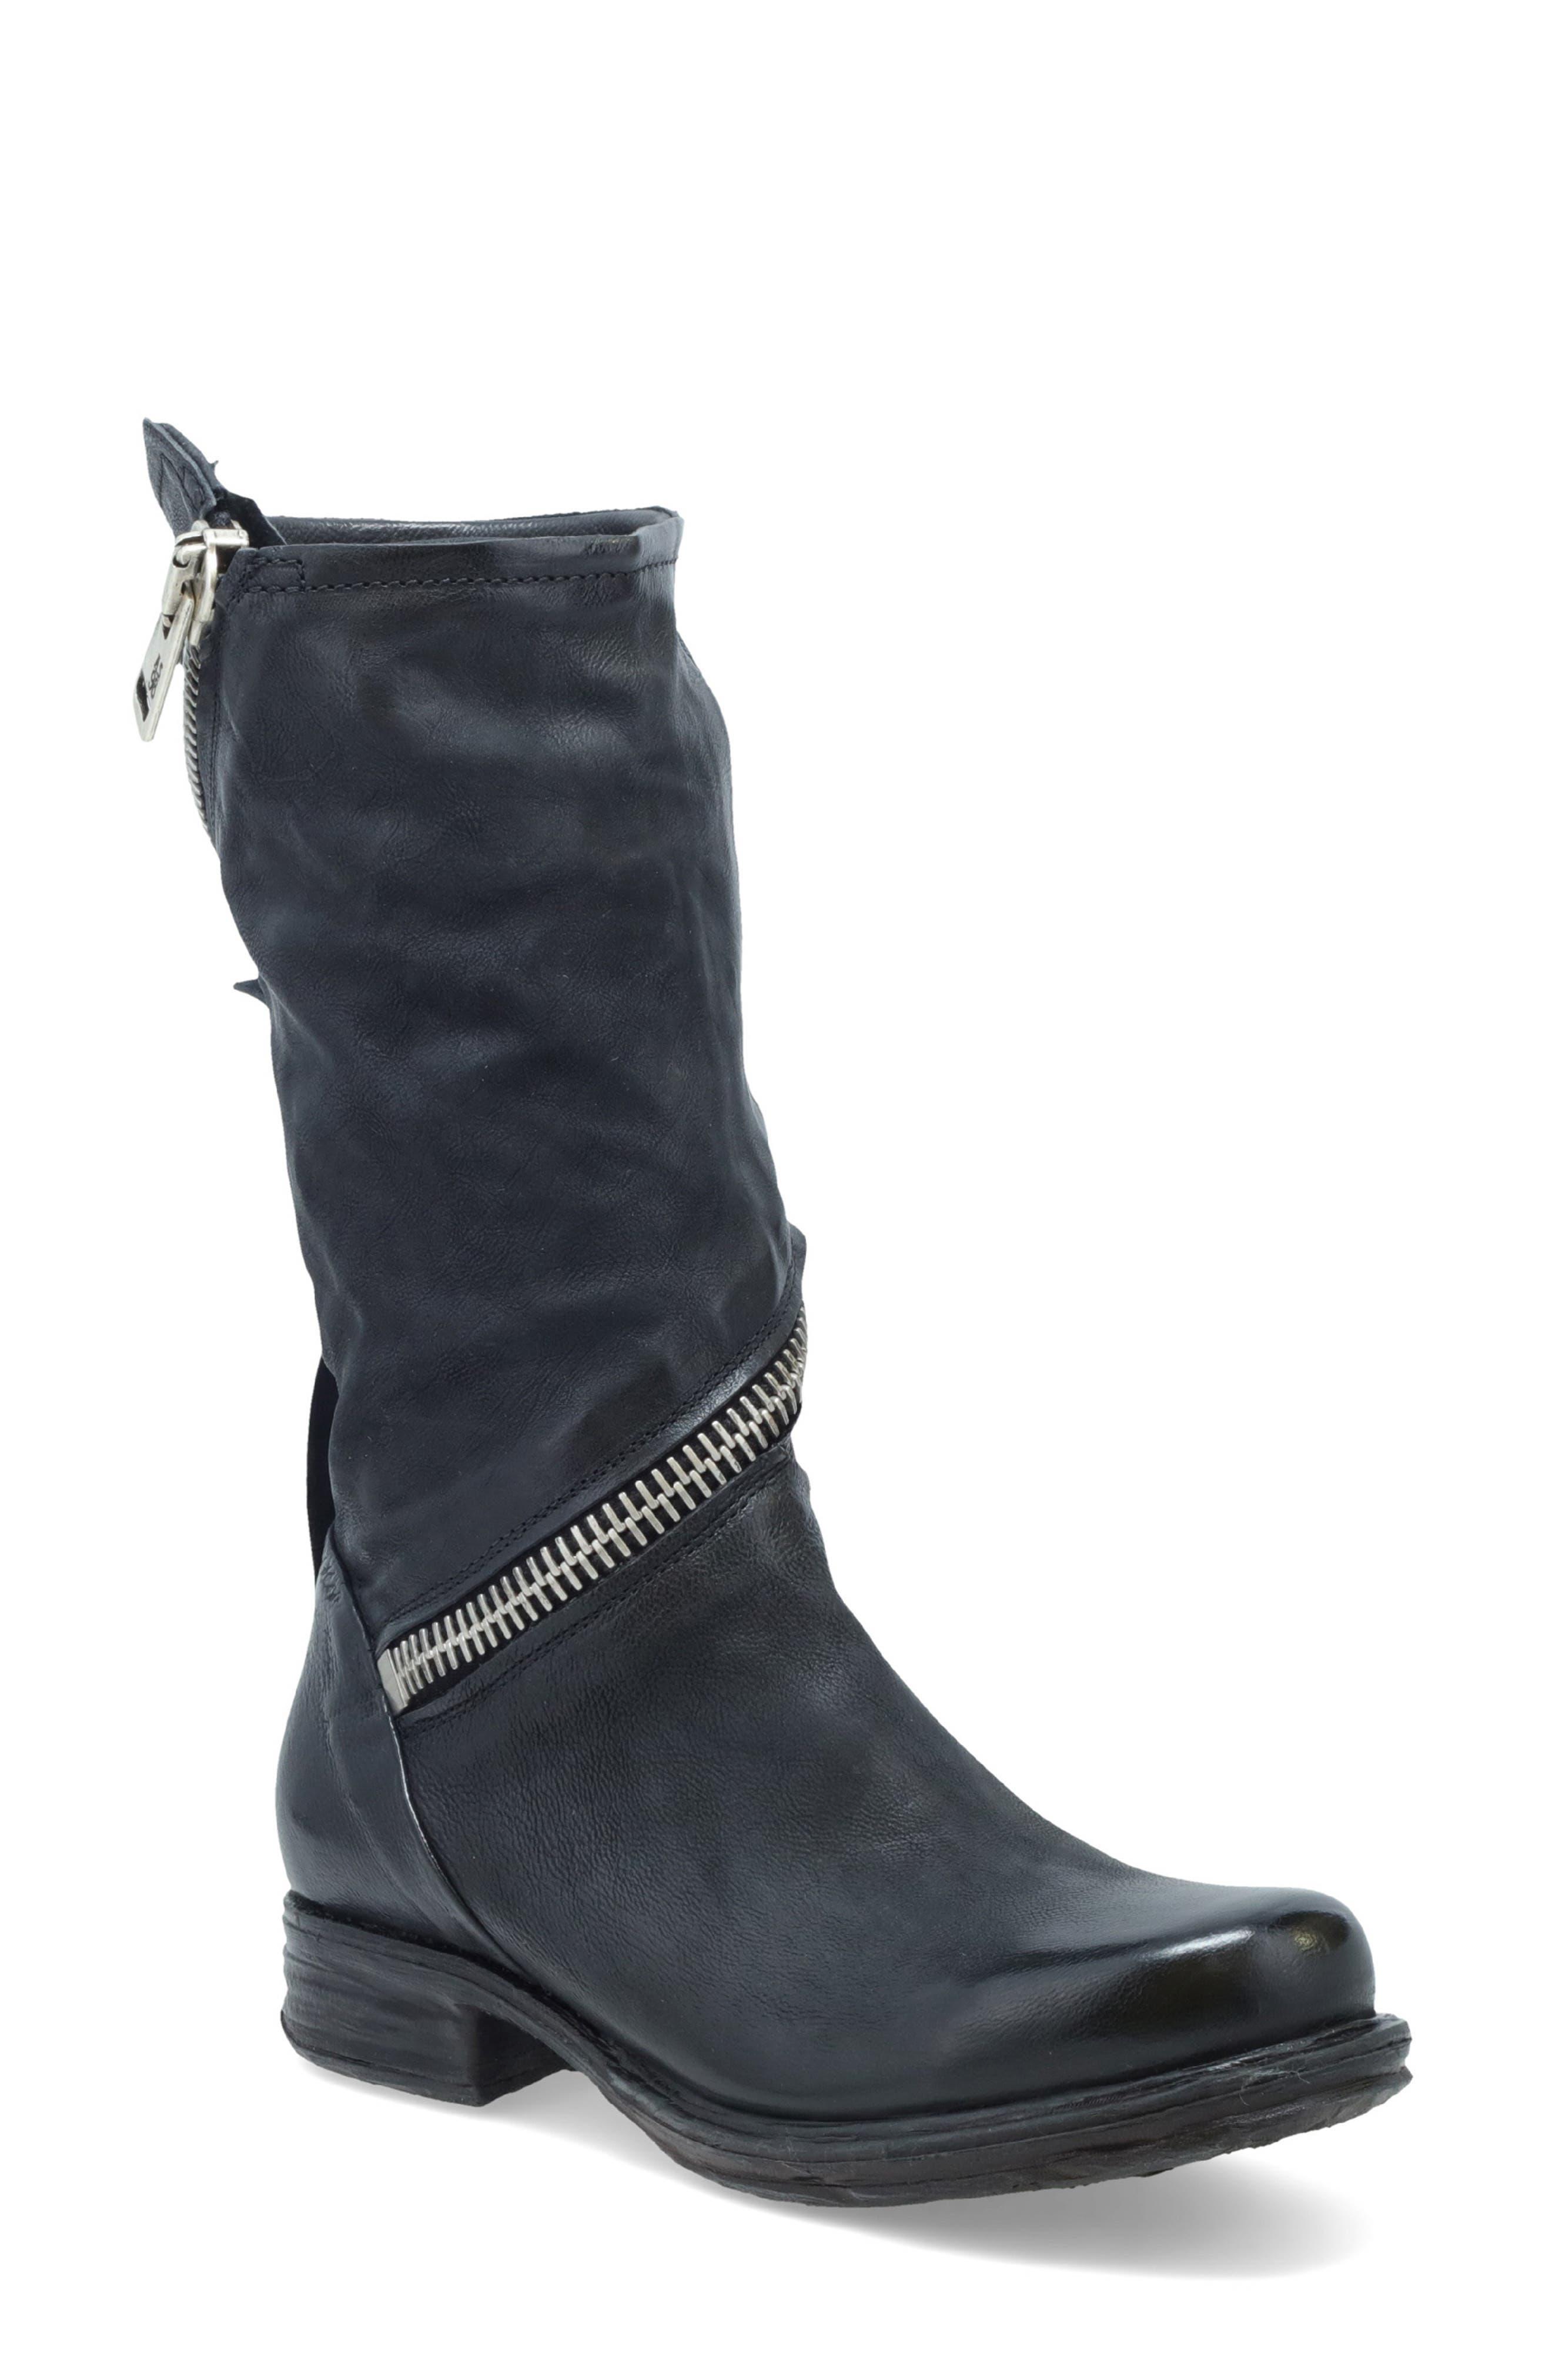 Women's A.s.98 Siggs Boot